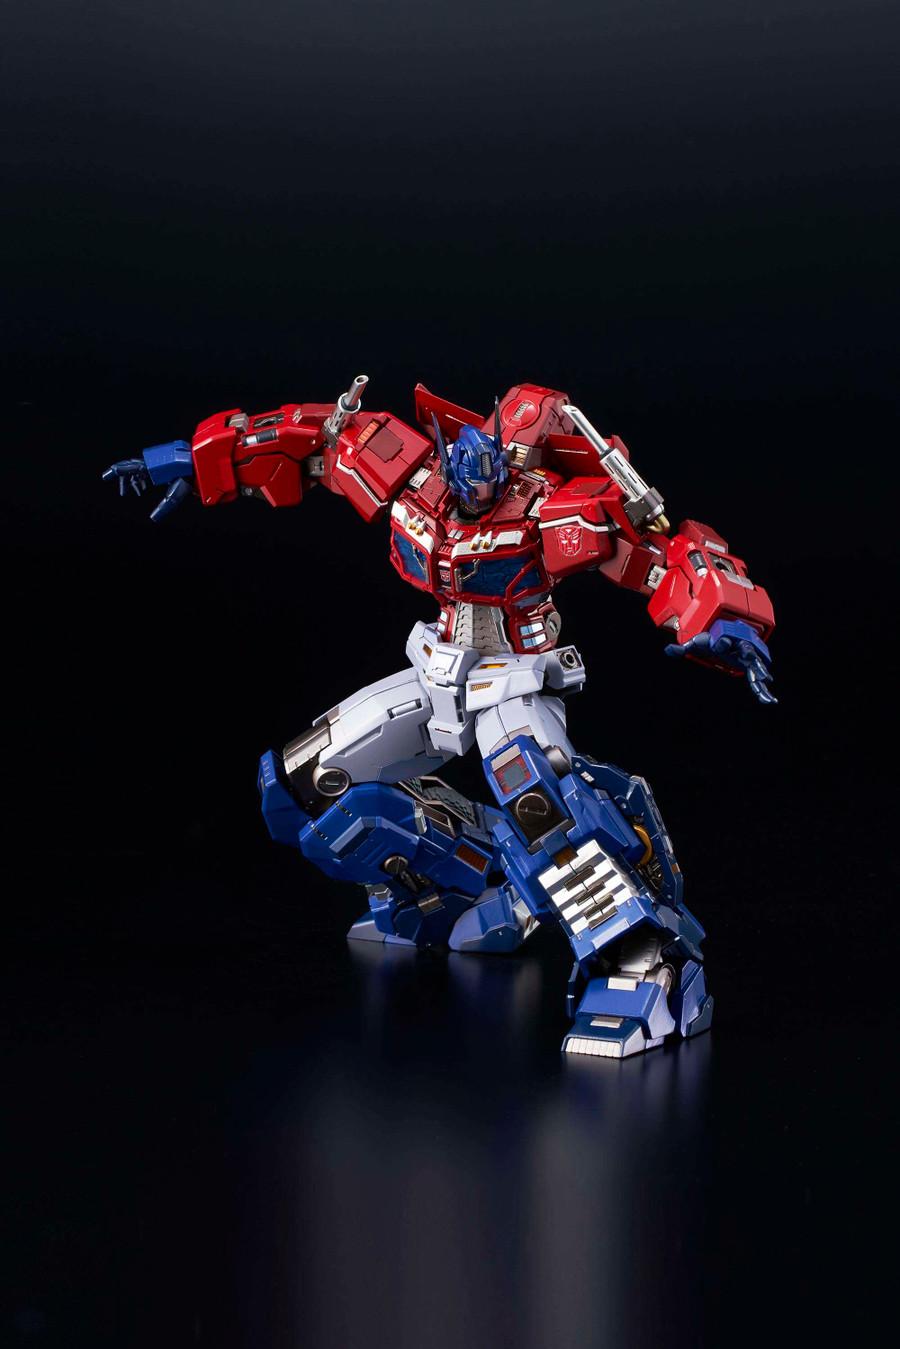 Flame Toys - Transformers Optimus Prime